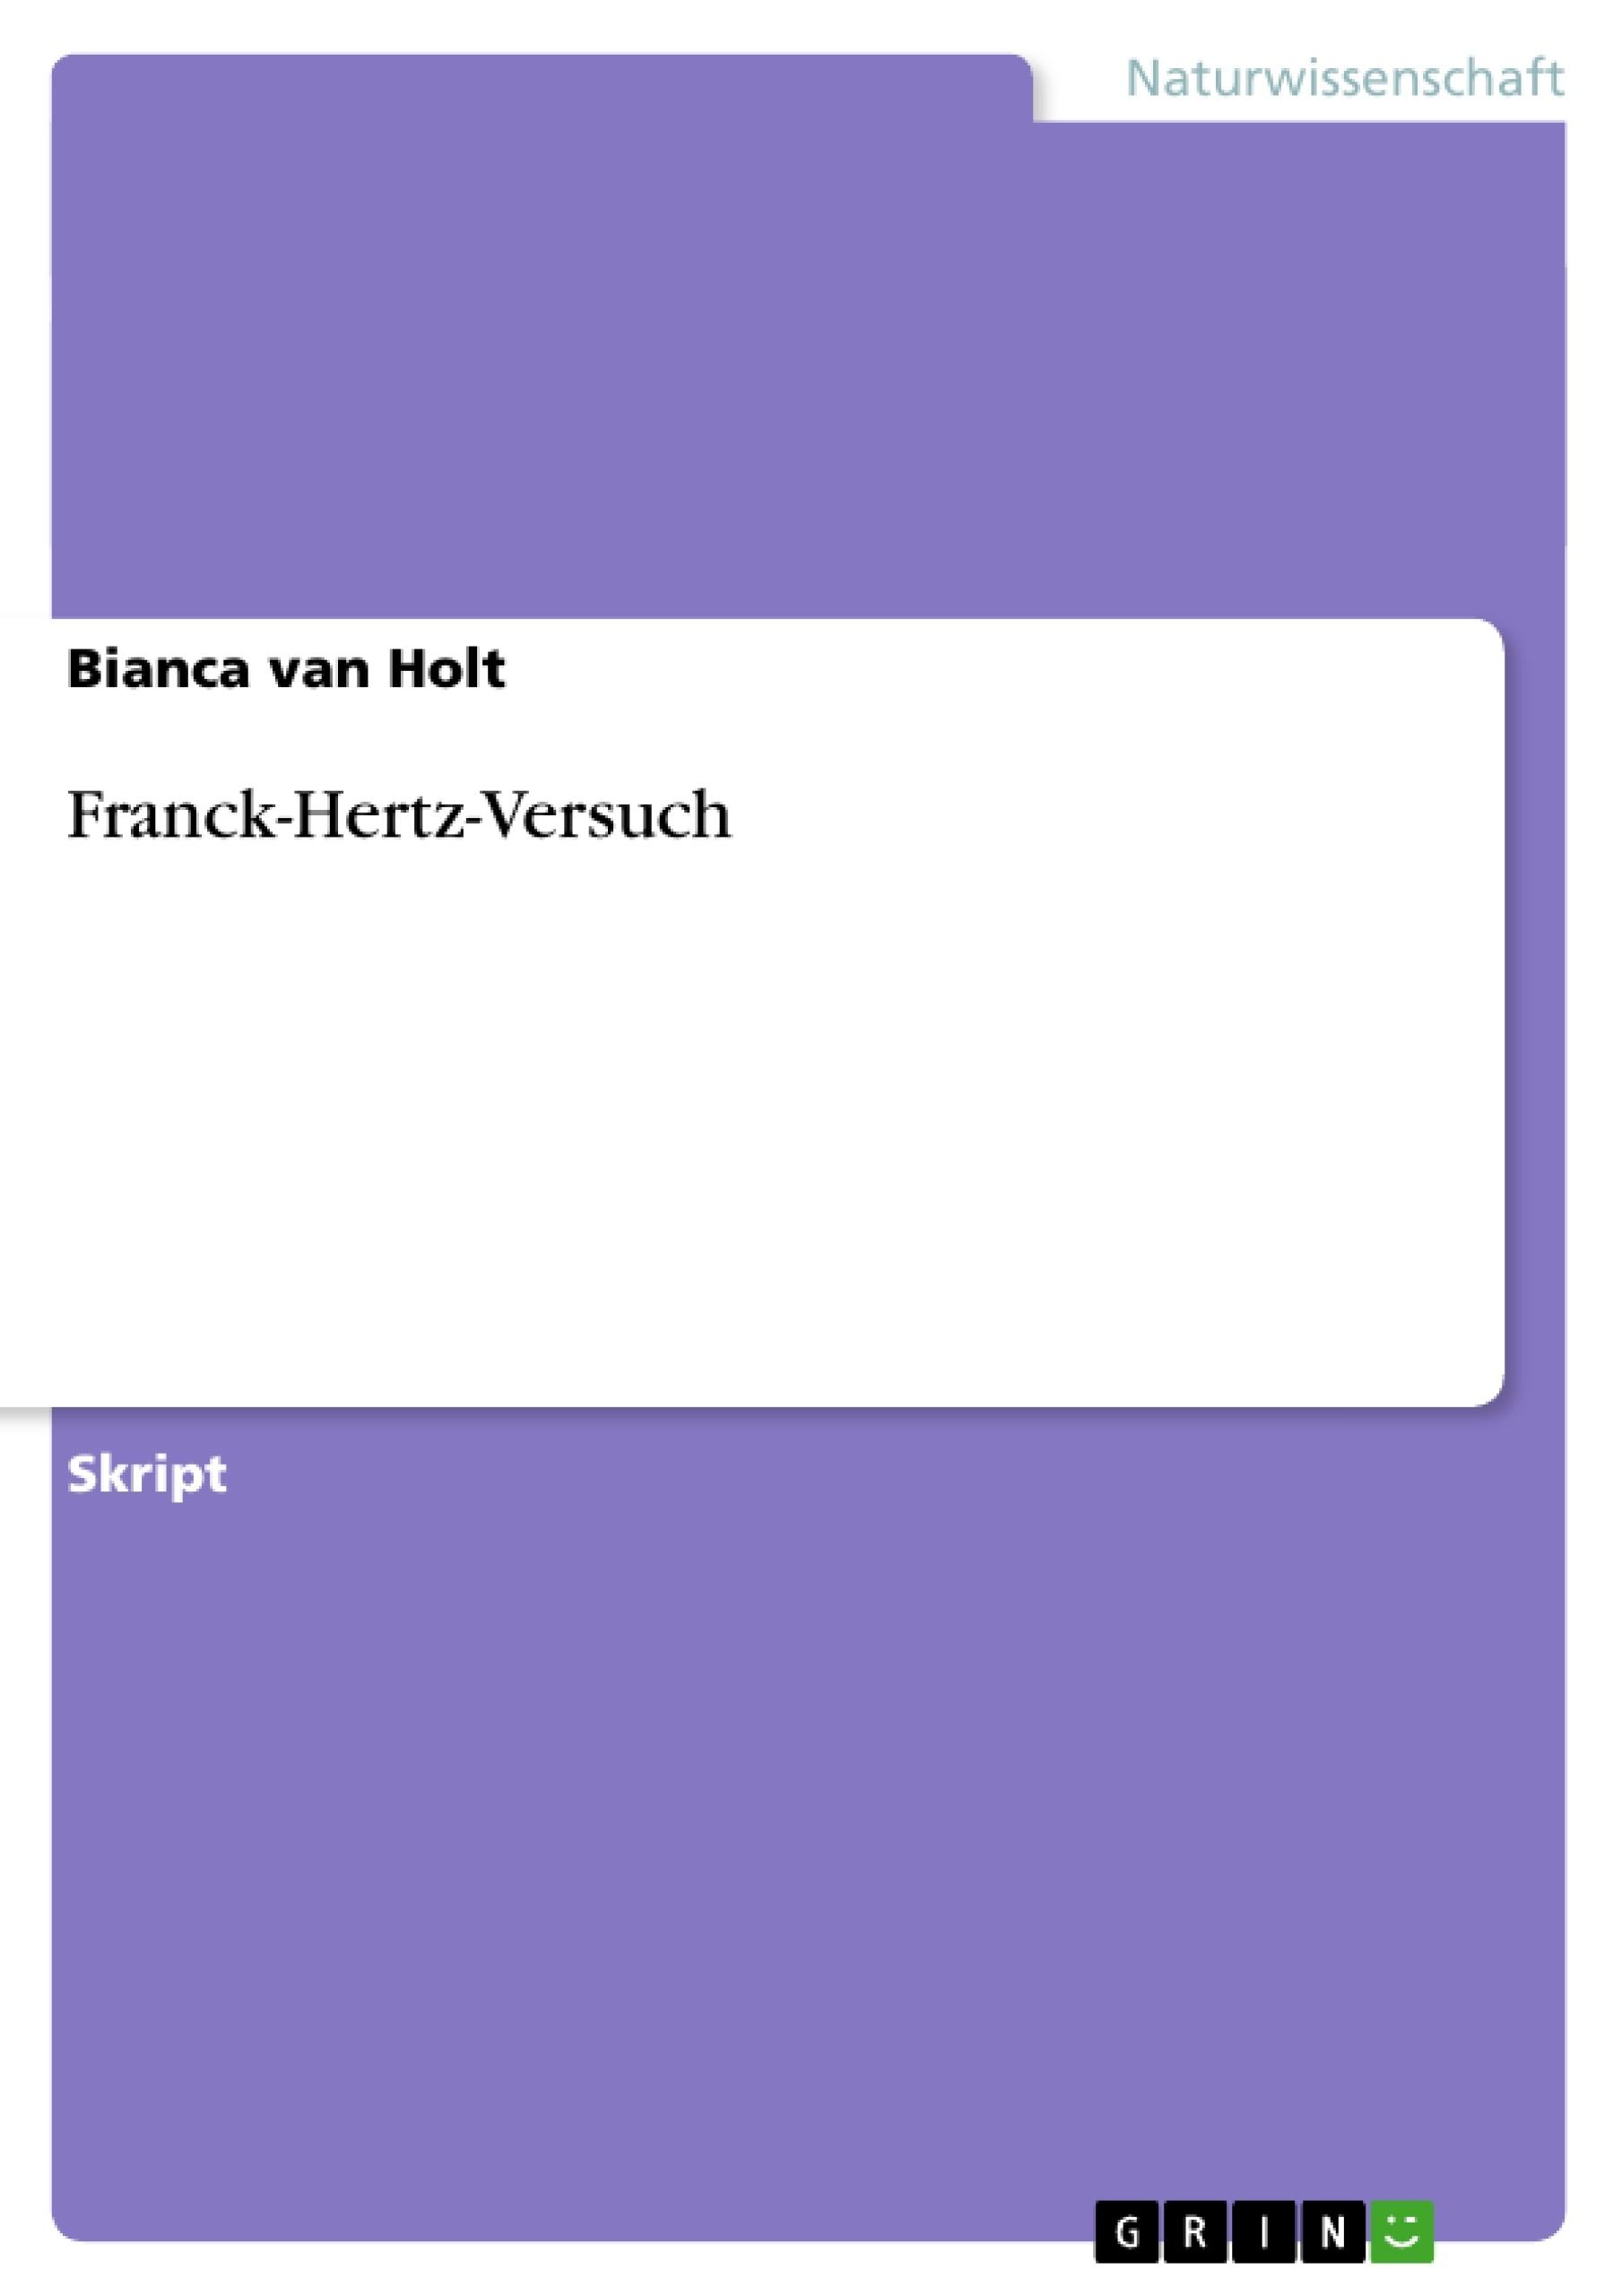 Titel: Franck-Hertz-Versuch